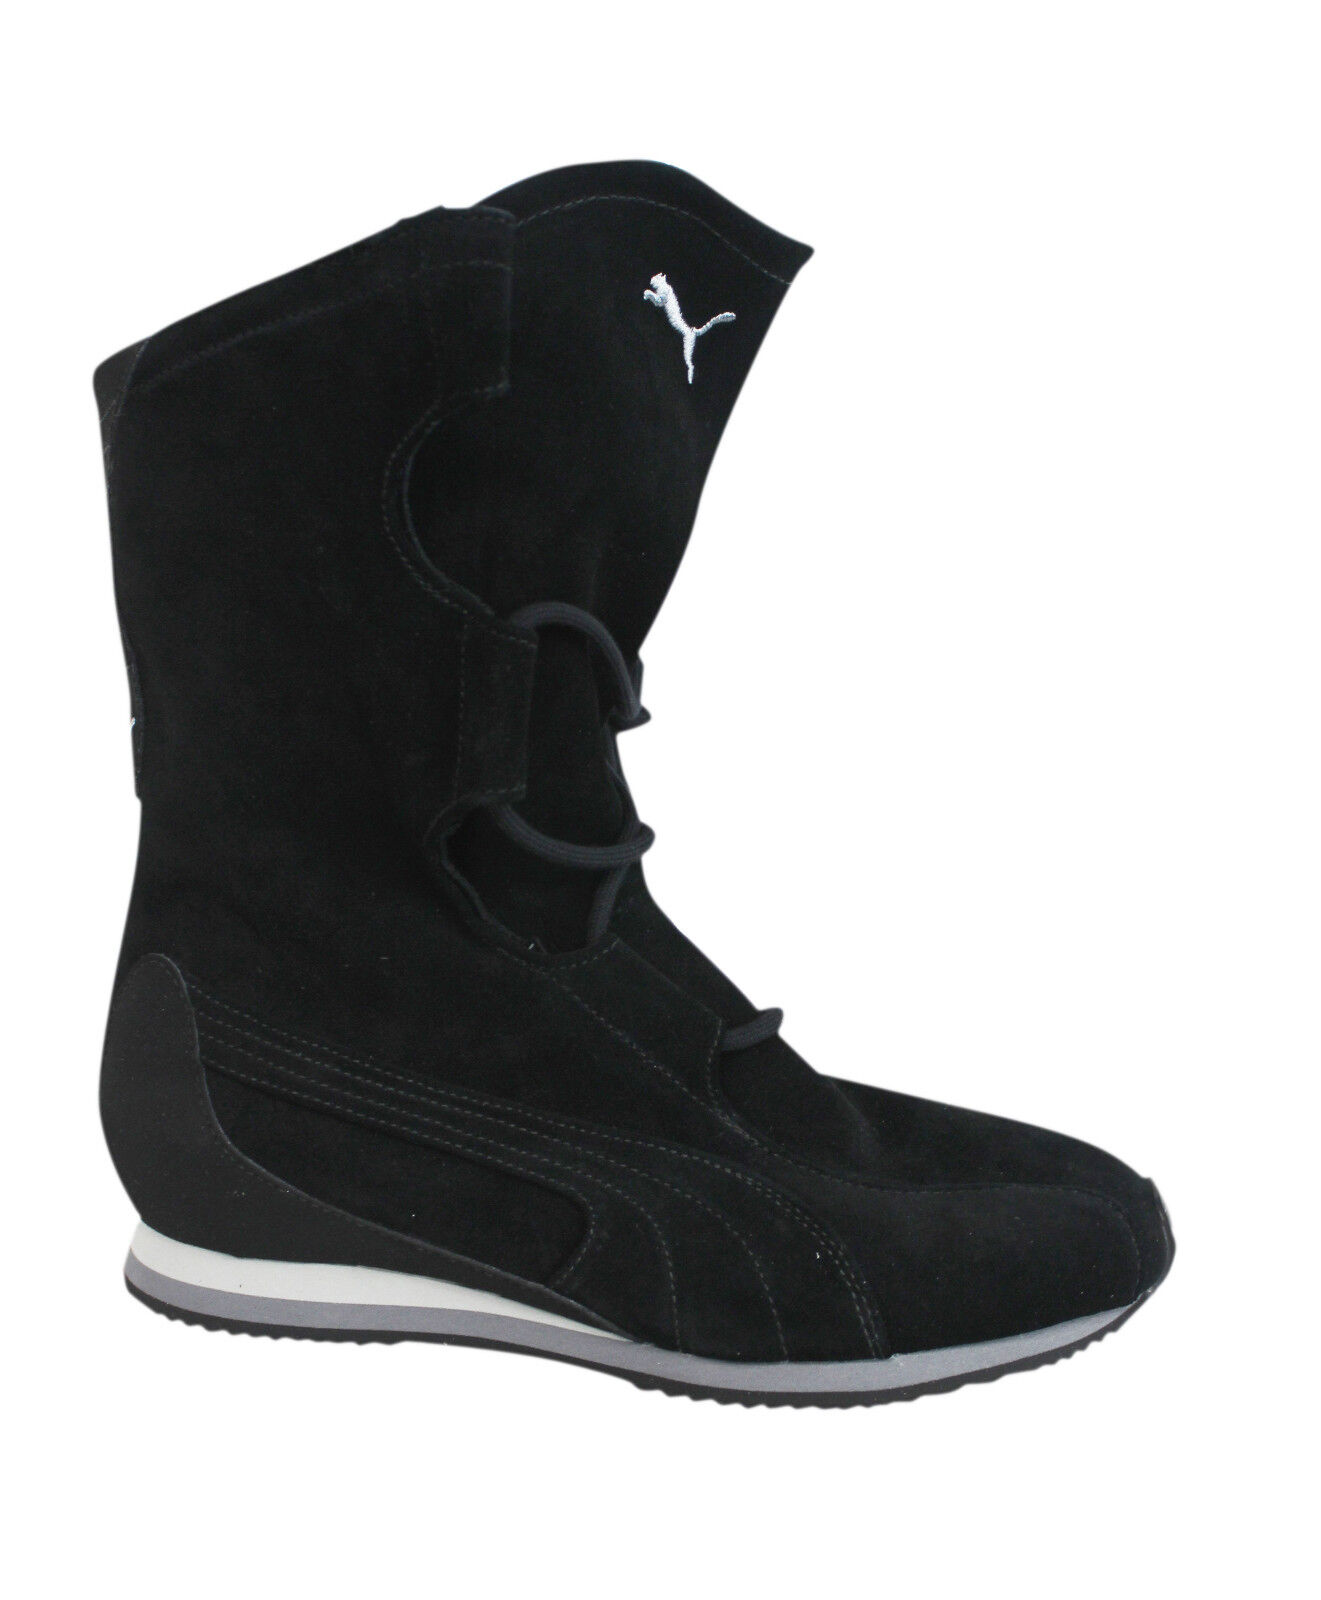 Puma Winter Flix II Lace Up Black Leather Womens Warm Boots 185581 ... 44ab57a9c